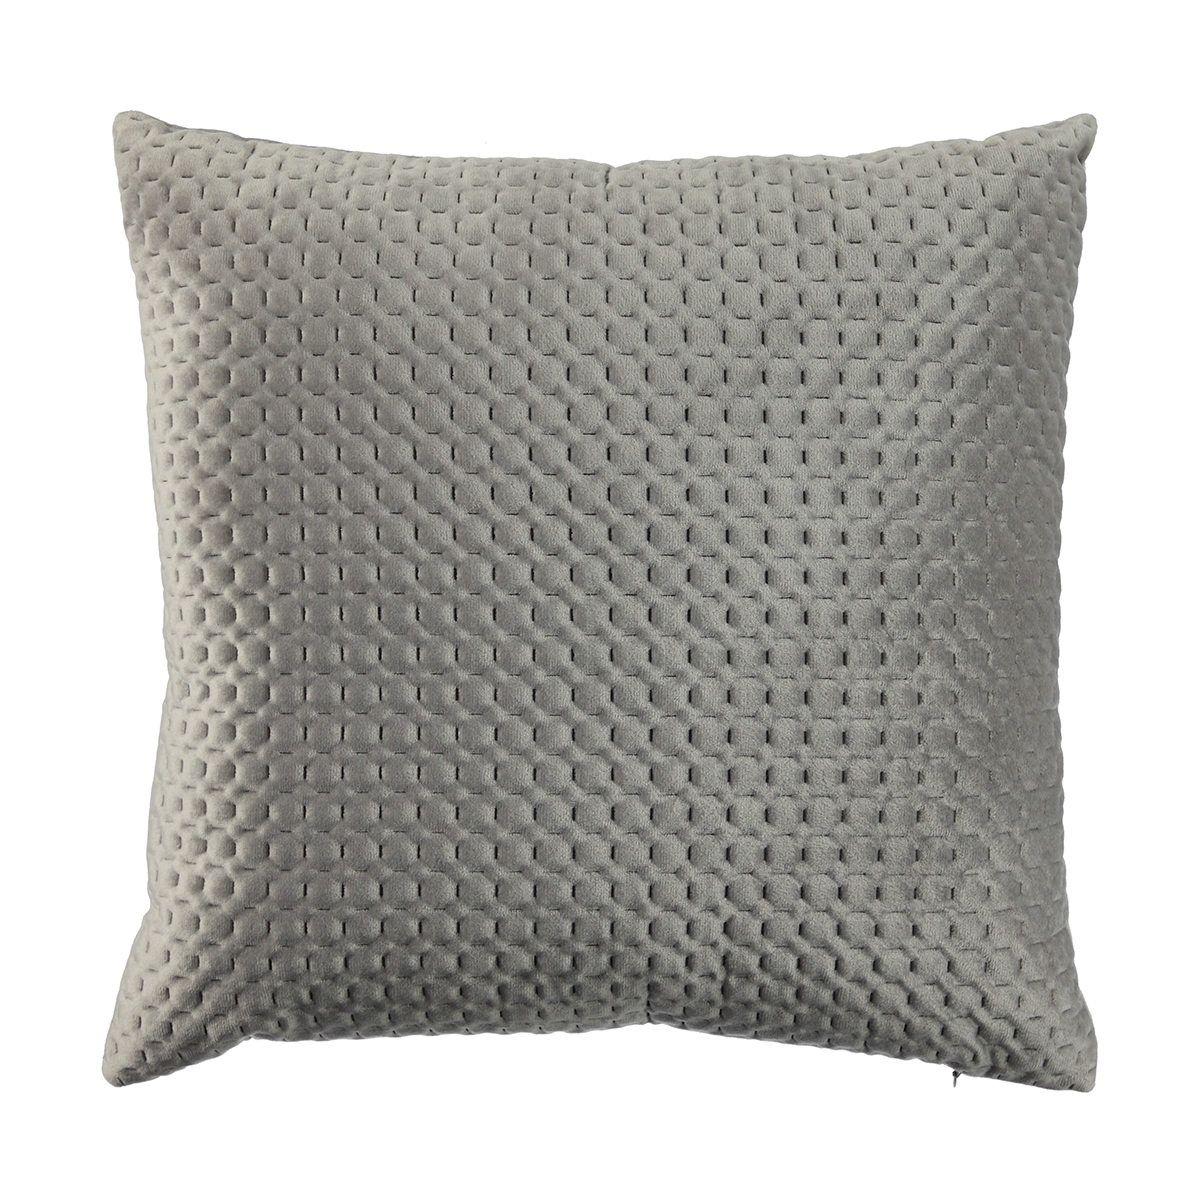 Lana Cushion Silver Cushions, Decorative cushions